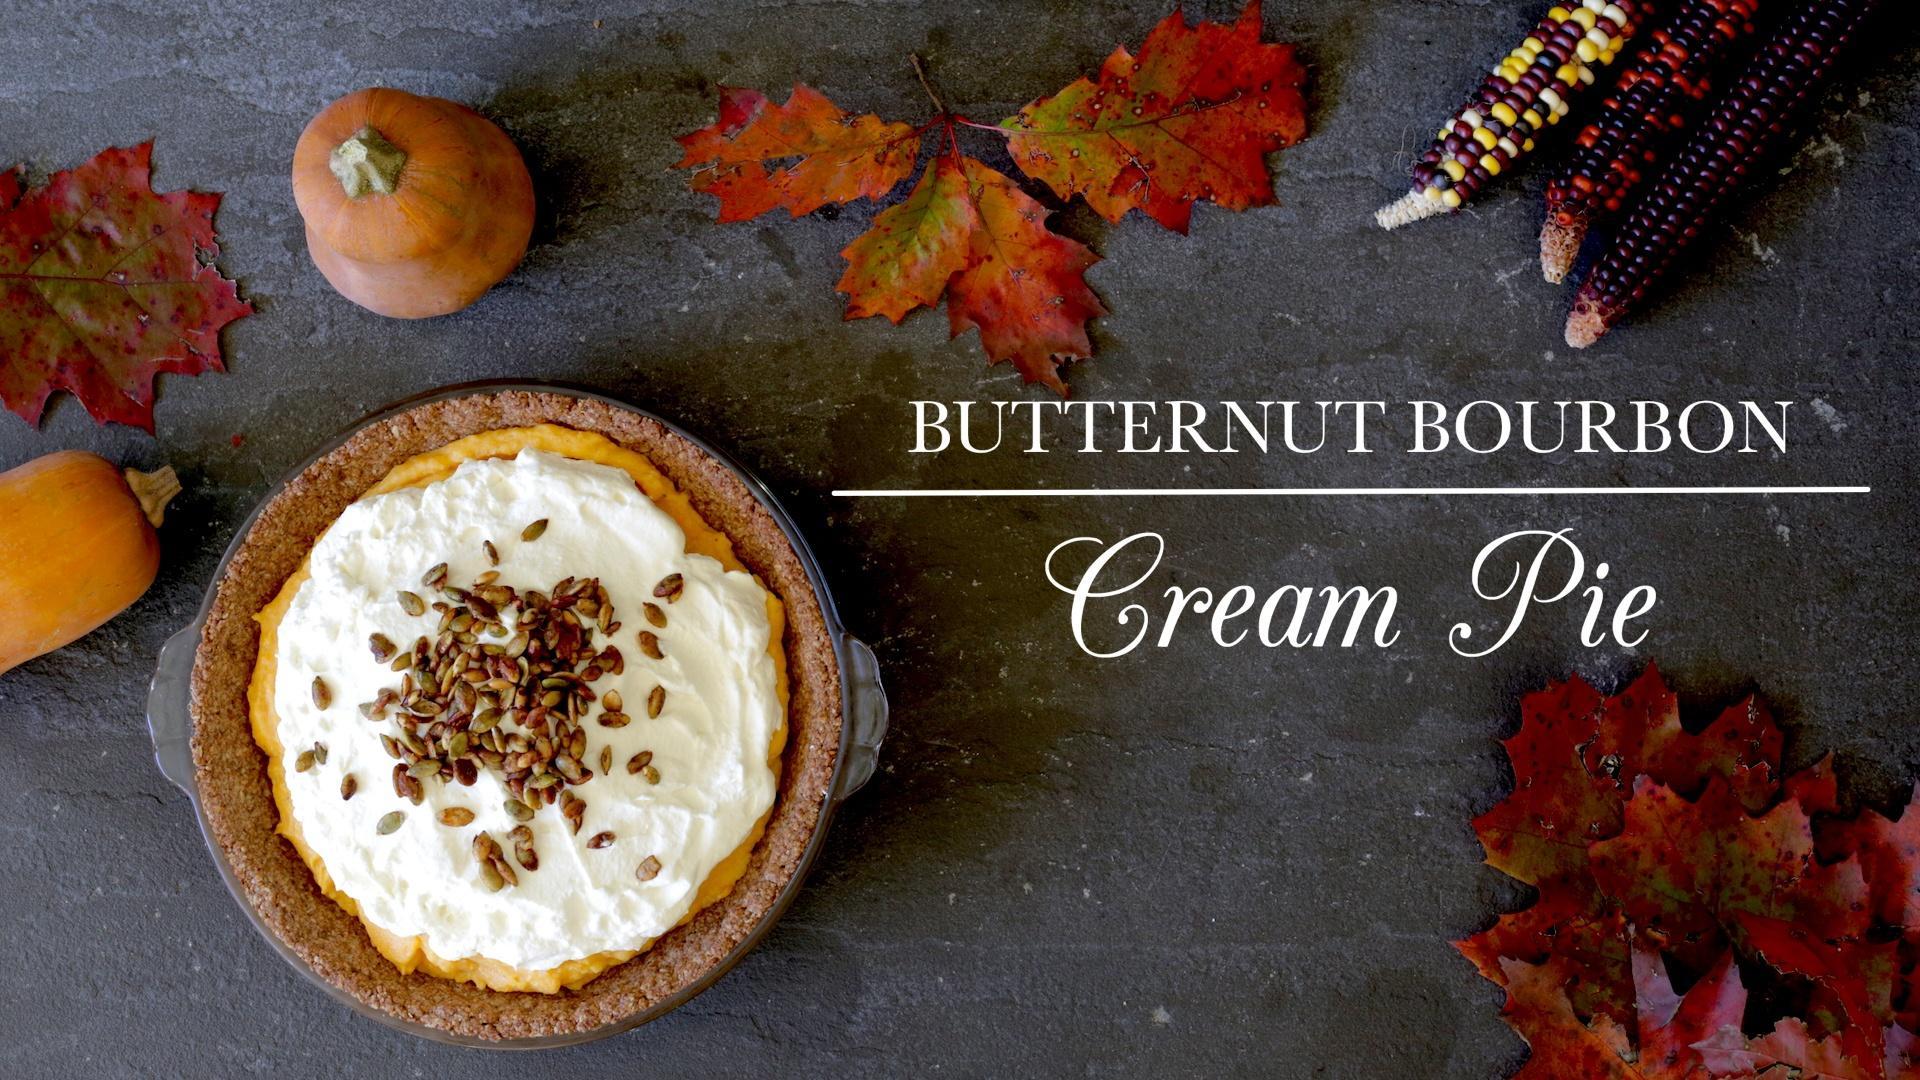 S5 Ep1: Butternut Bourbon Cream Pie